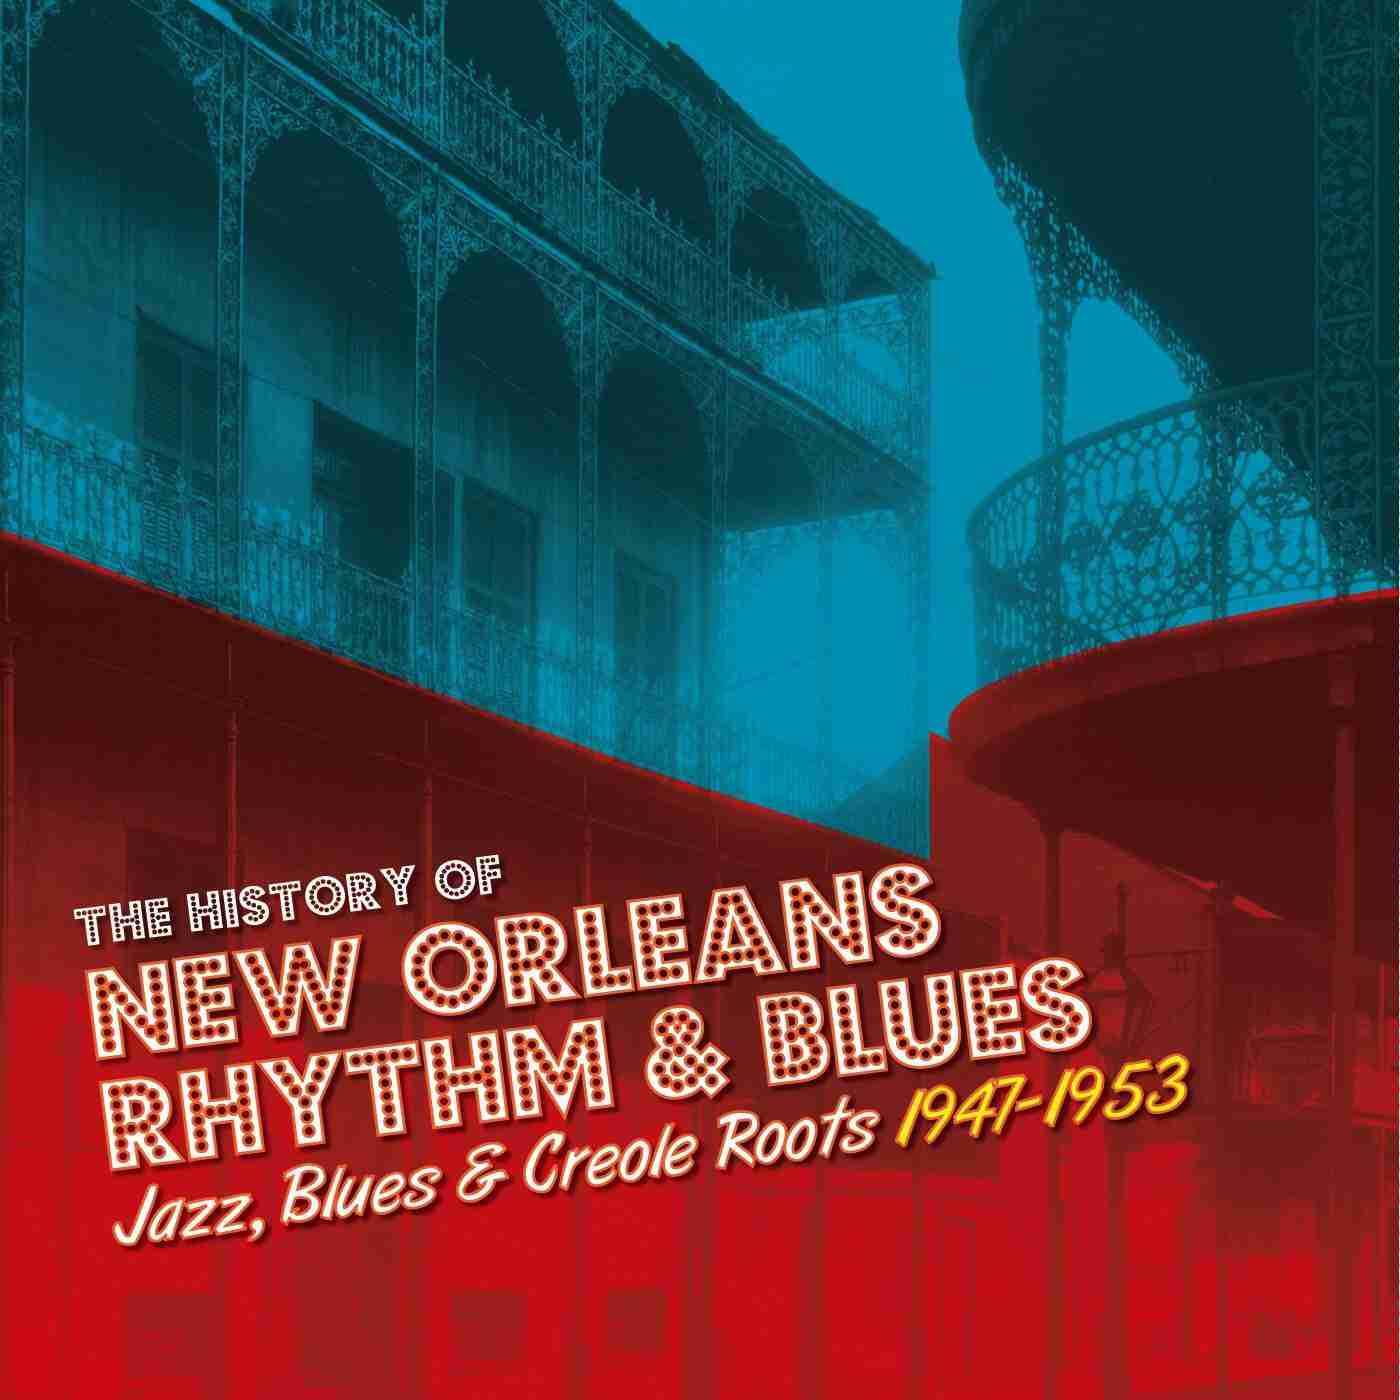 The History of New Orleans Rhythm & Blues Vol 2